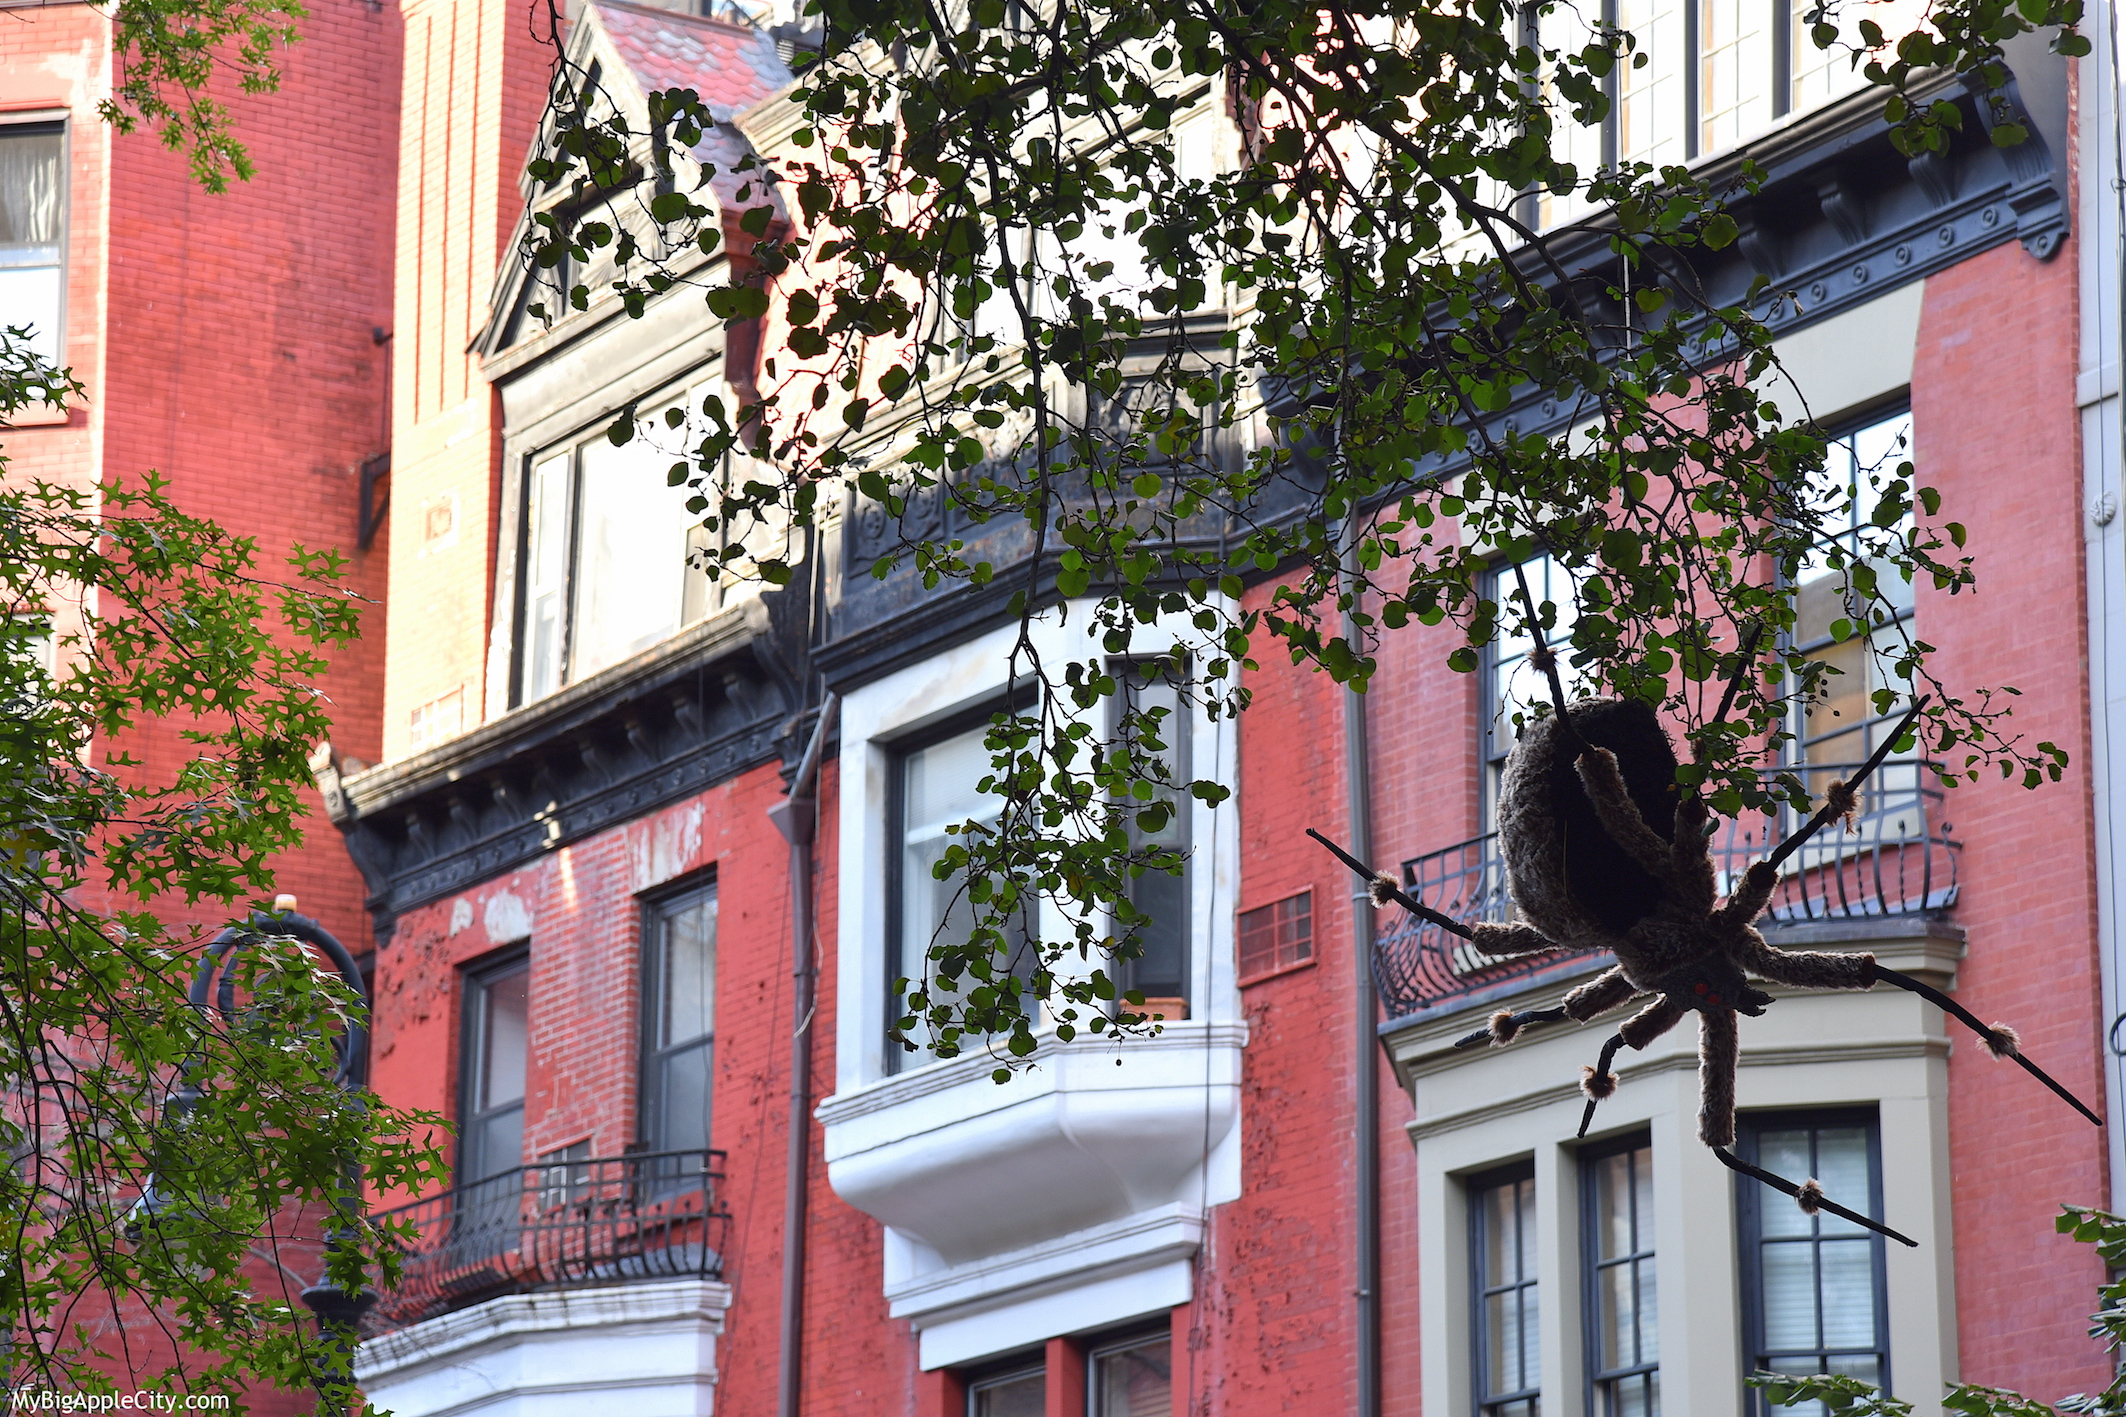 Spider-Halloween-NYC-2015-blog-lifestyle-voyageNew-York